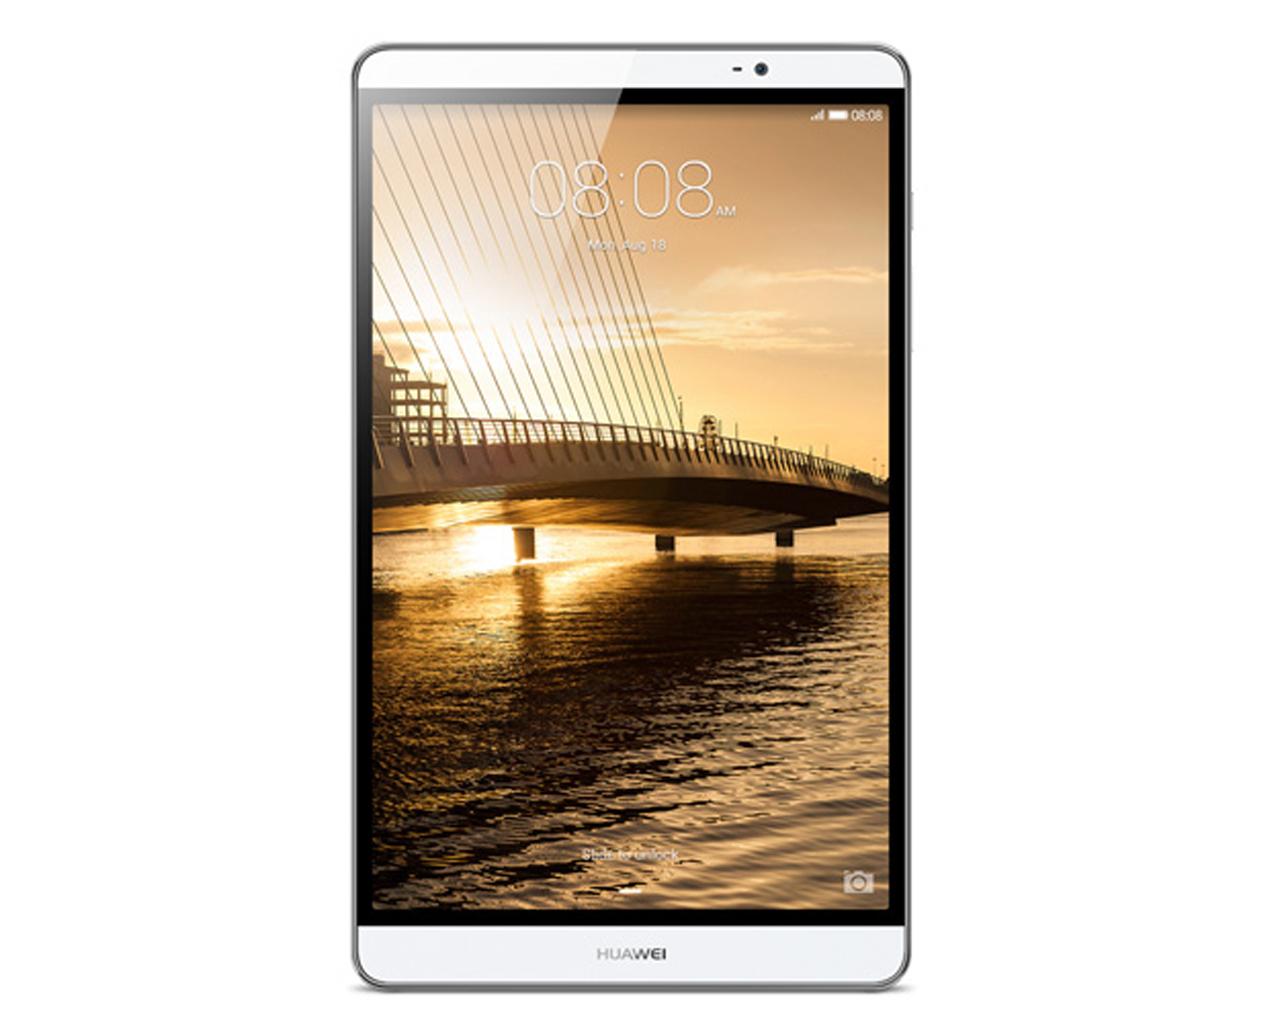 Test Huawei MediaPad M2 Tablet